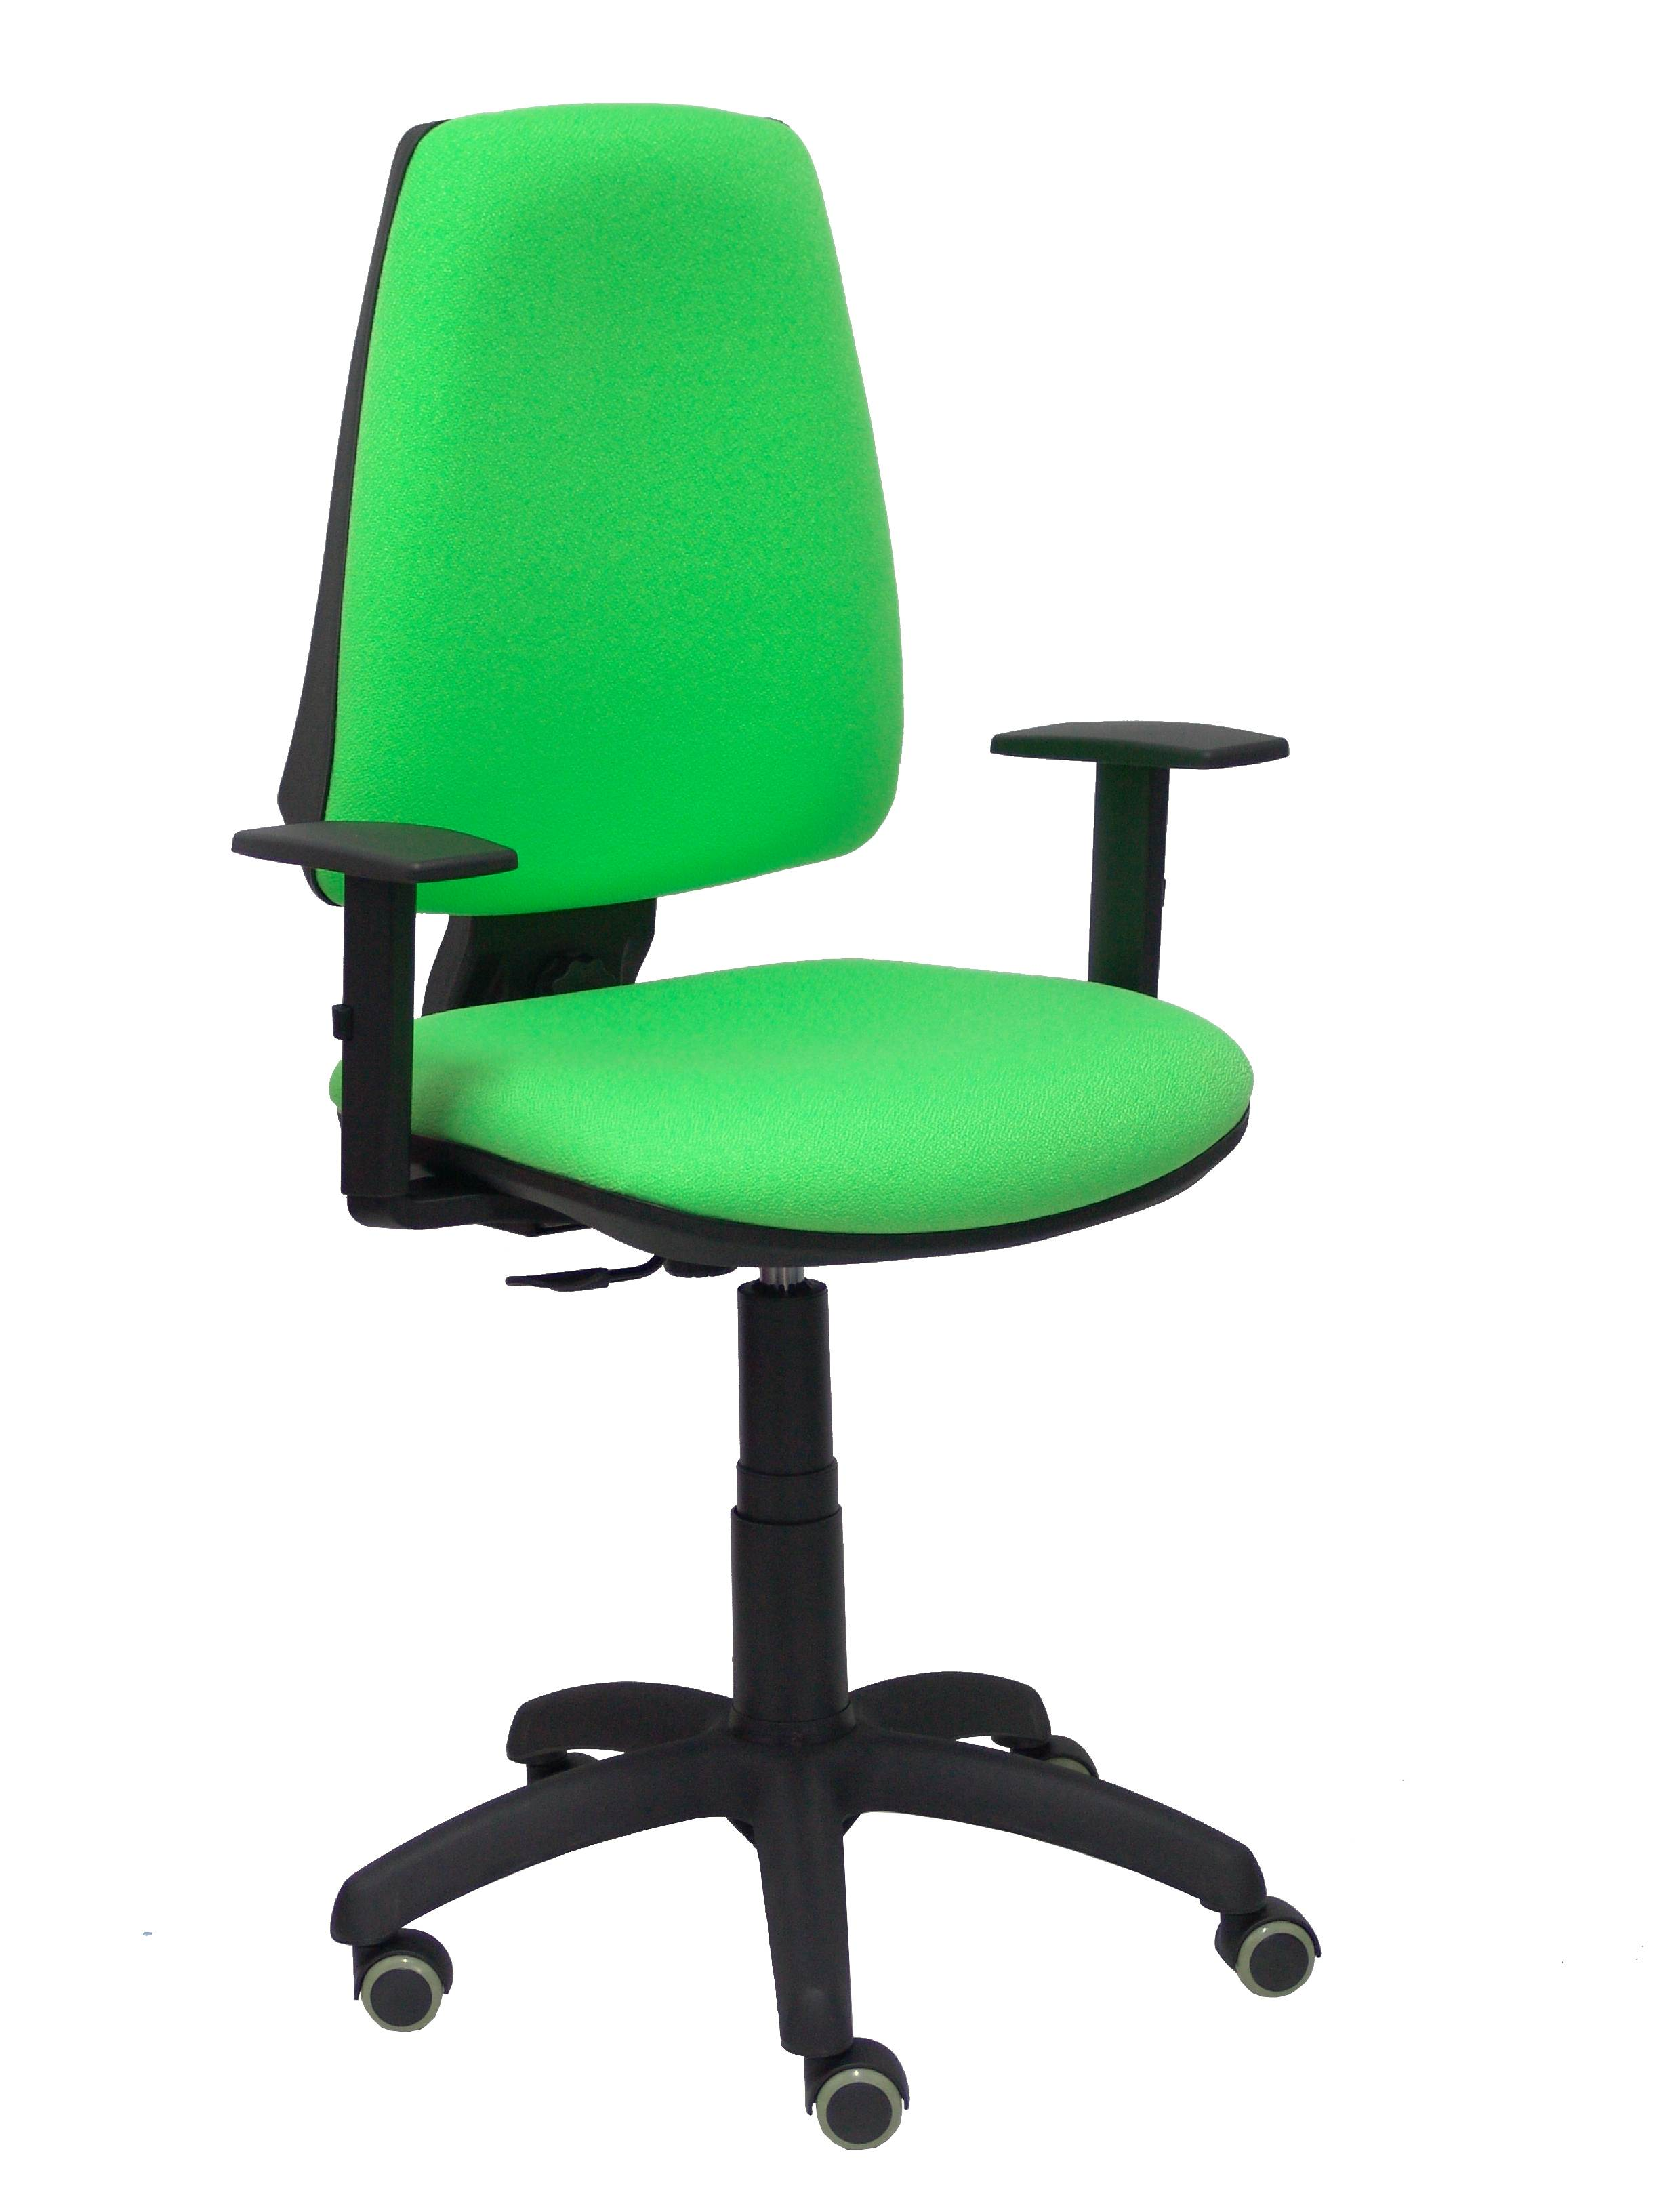 Silla Elche CP bali verde pistacho brazos regulables ruedas de parquet